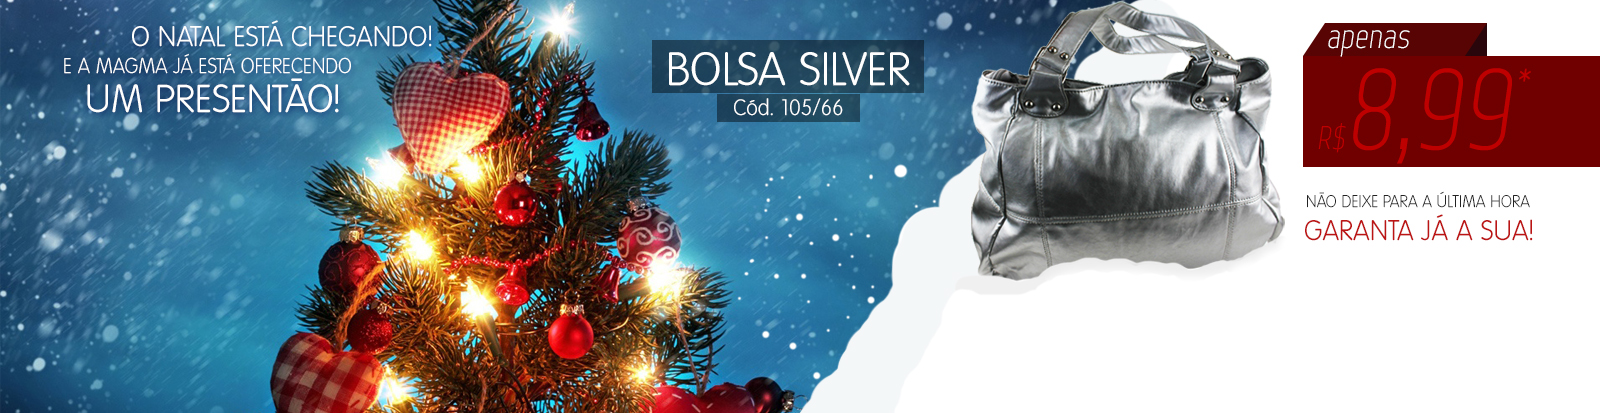 bolsa-silver-natal